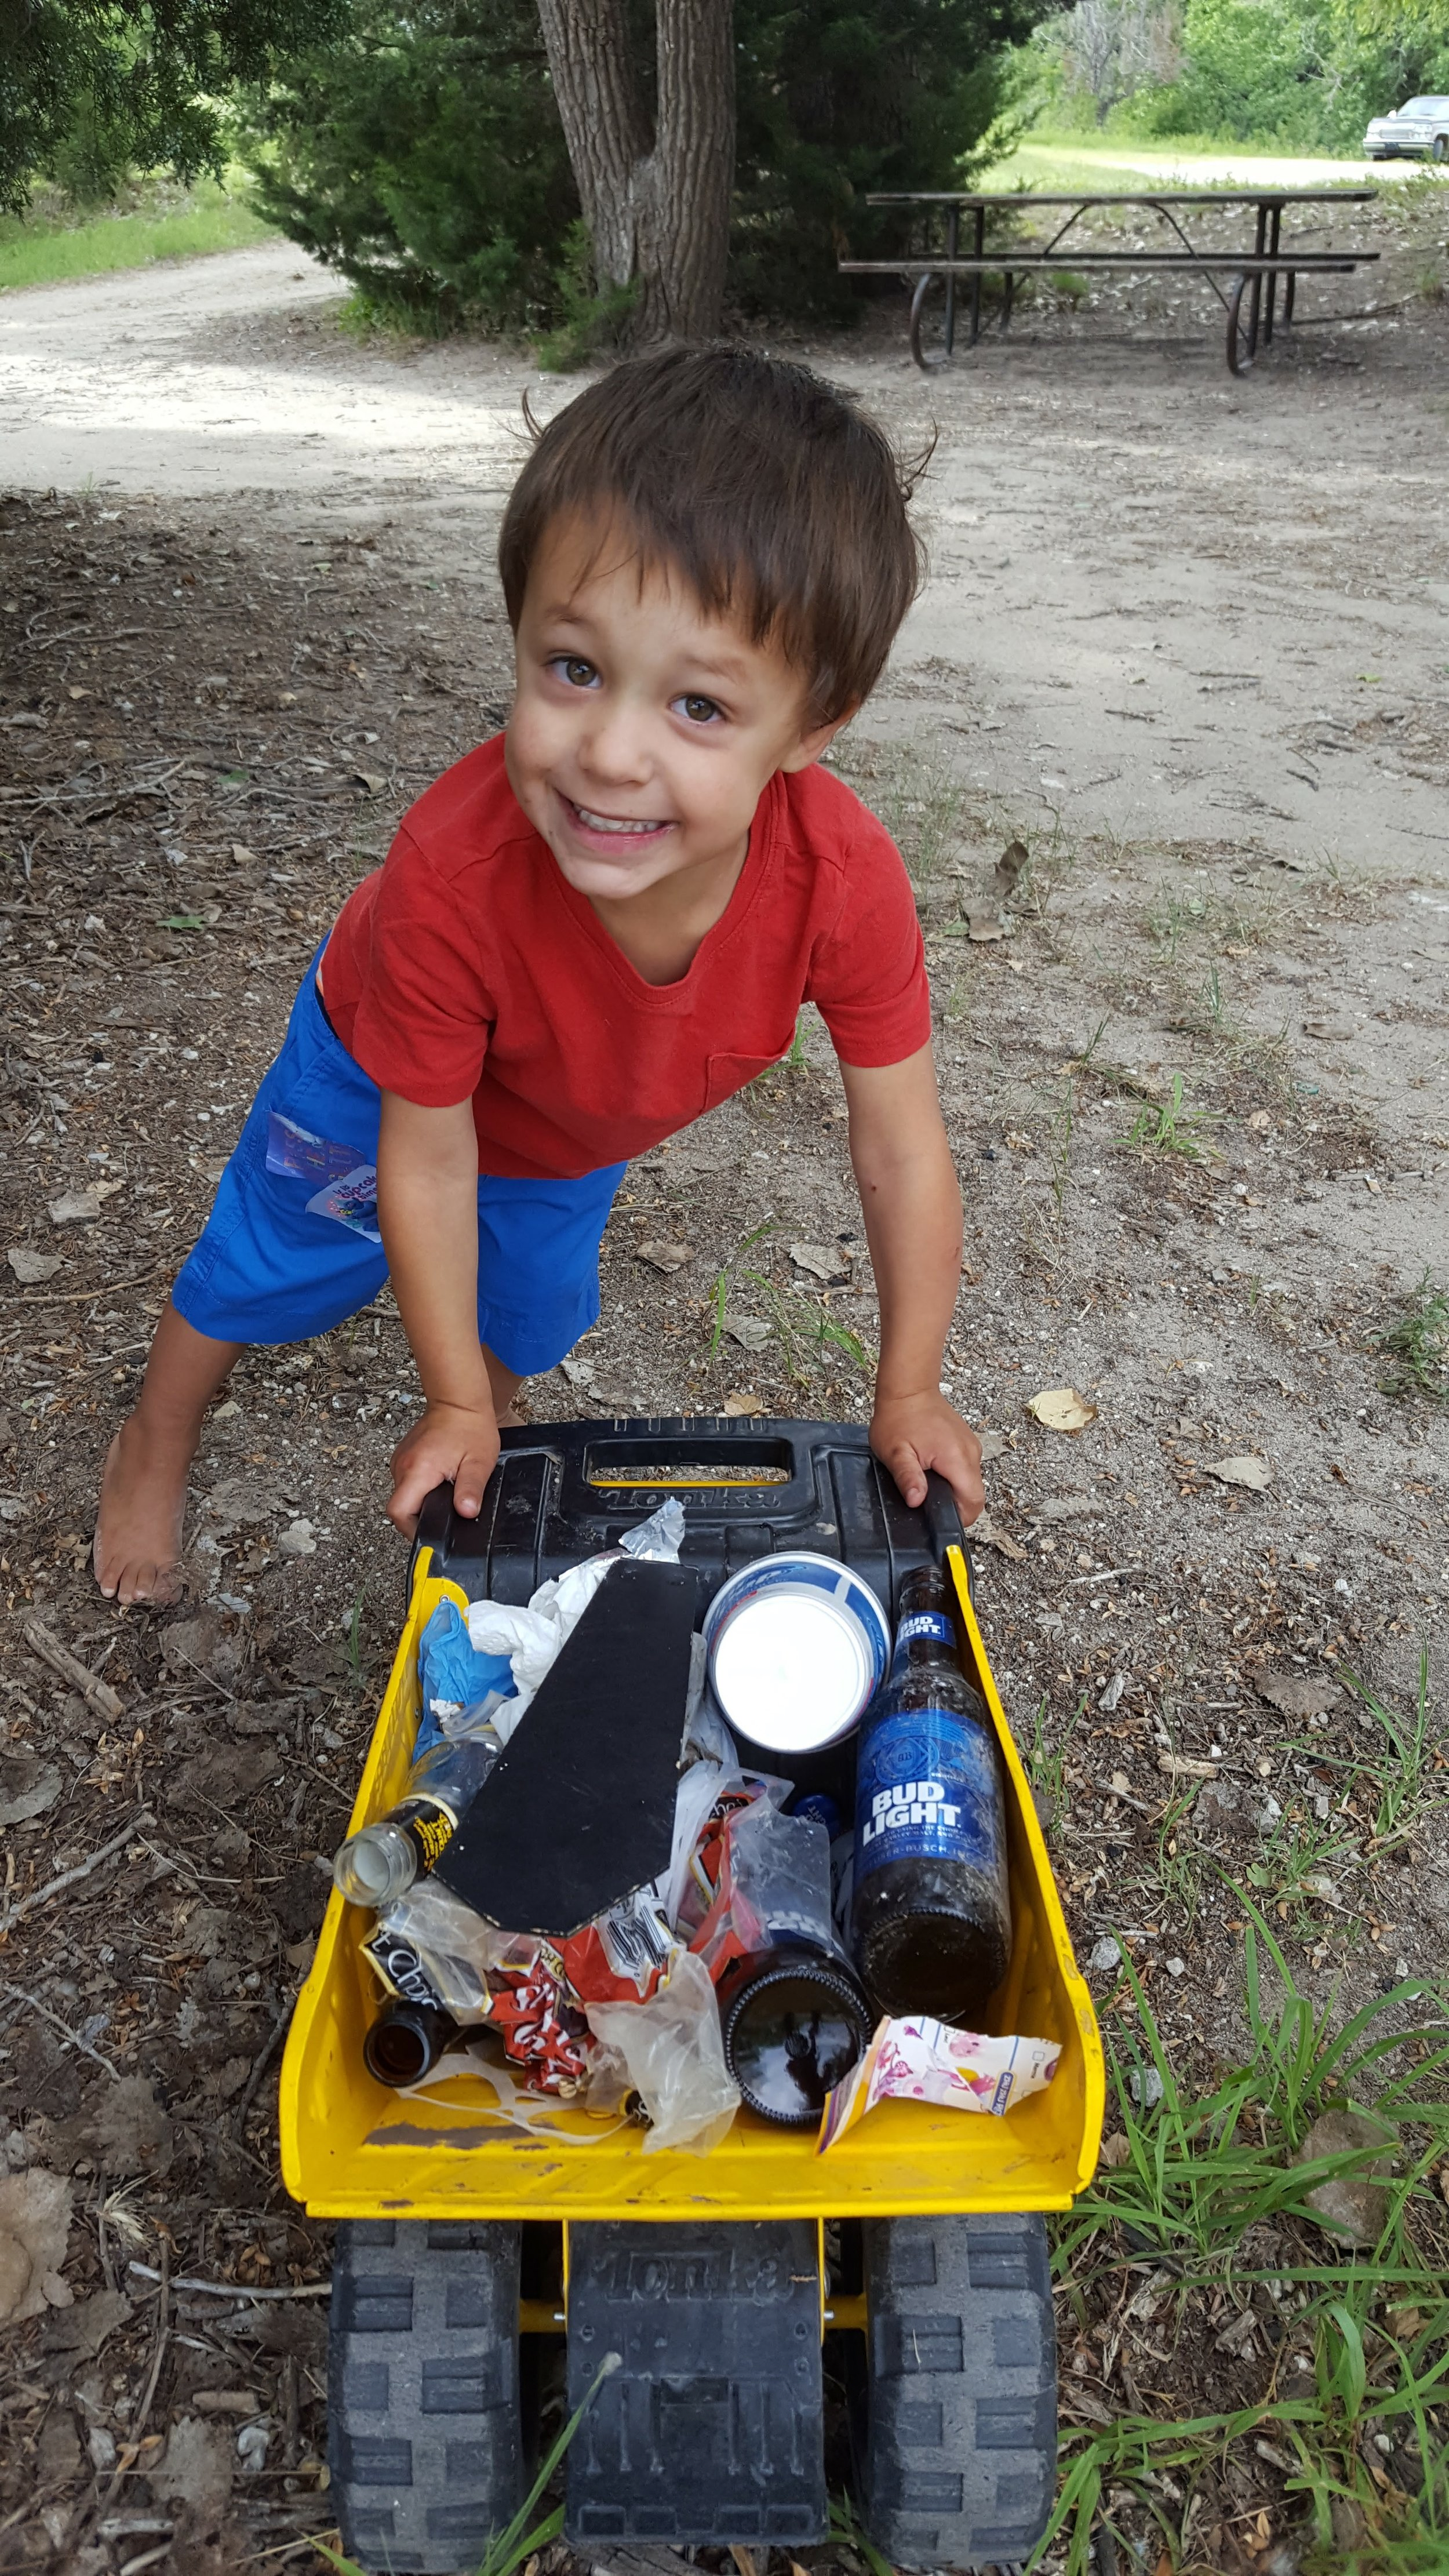 Day 4: Campsite Trash Pick-Up